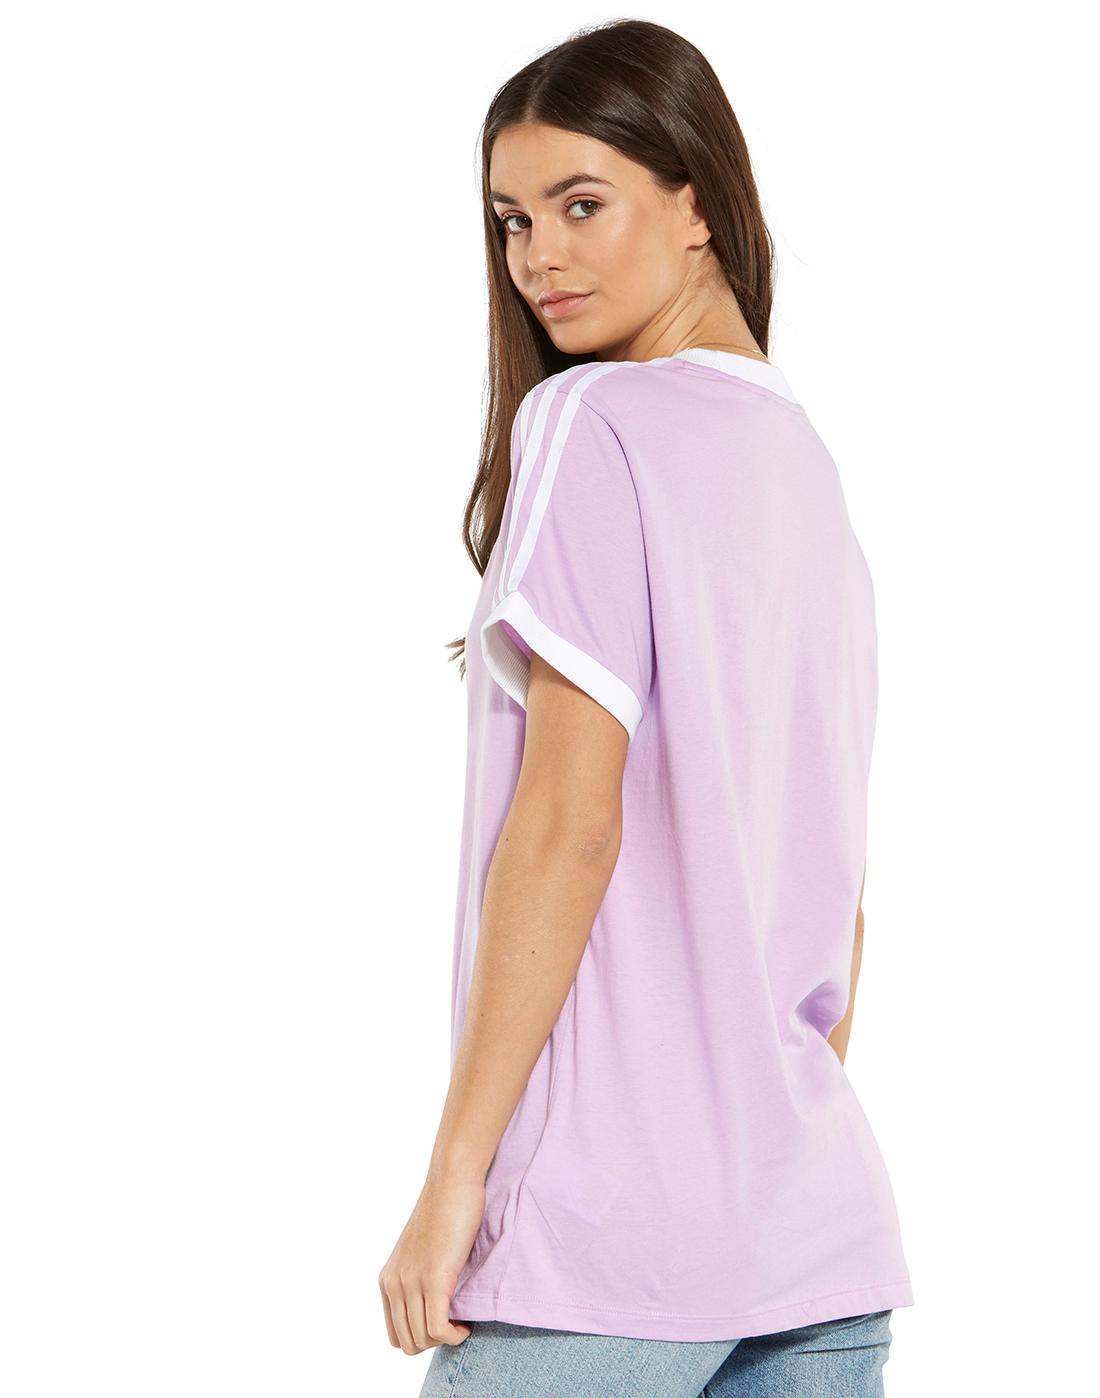 0fa6e85d429 Women's Purple adidas Originals 3-Stripe T-Shirt | Life Style Sports